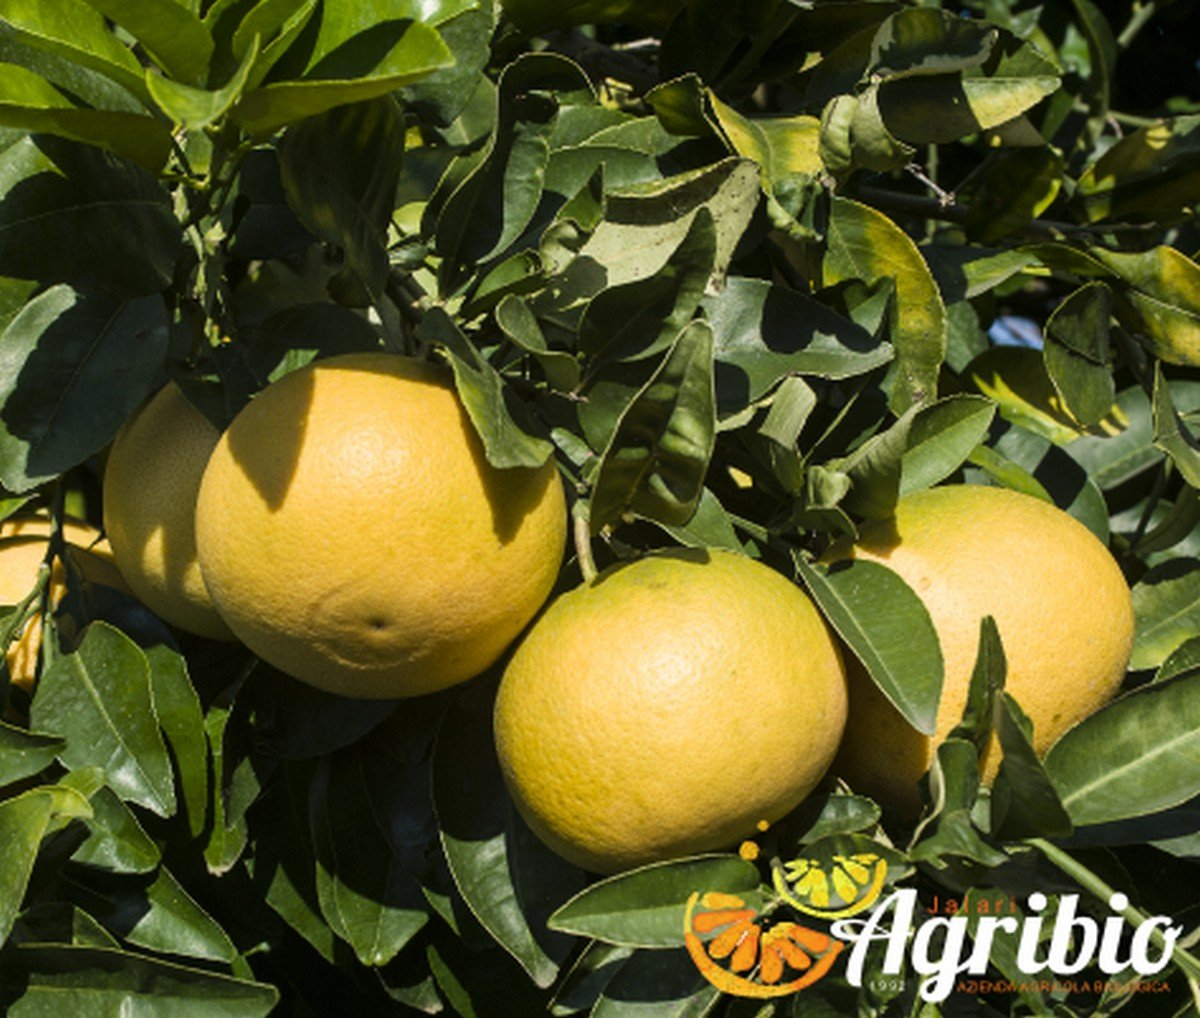 Azienda agricola biologica jalari - Agrumi biologici siciliani - pompelmo rosa